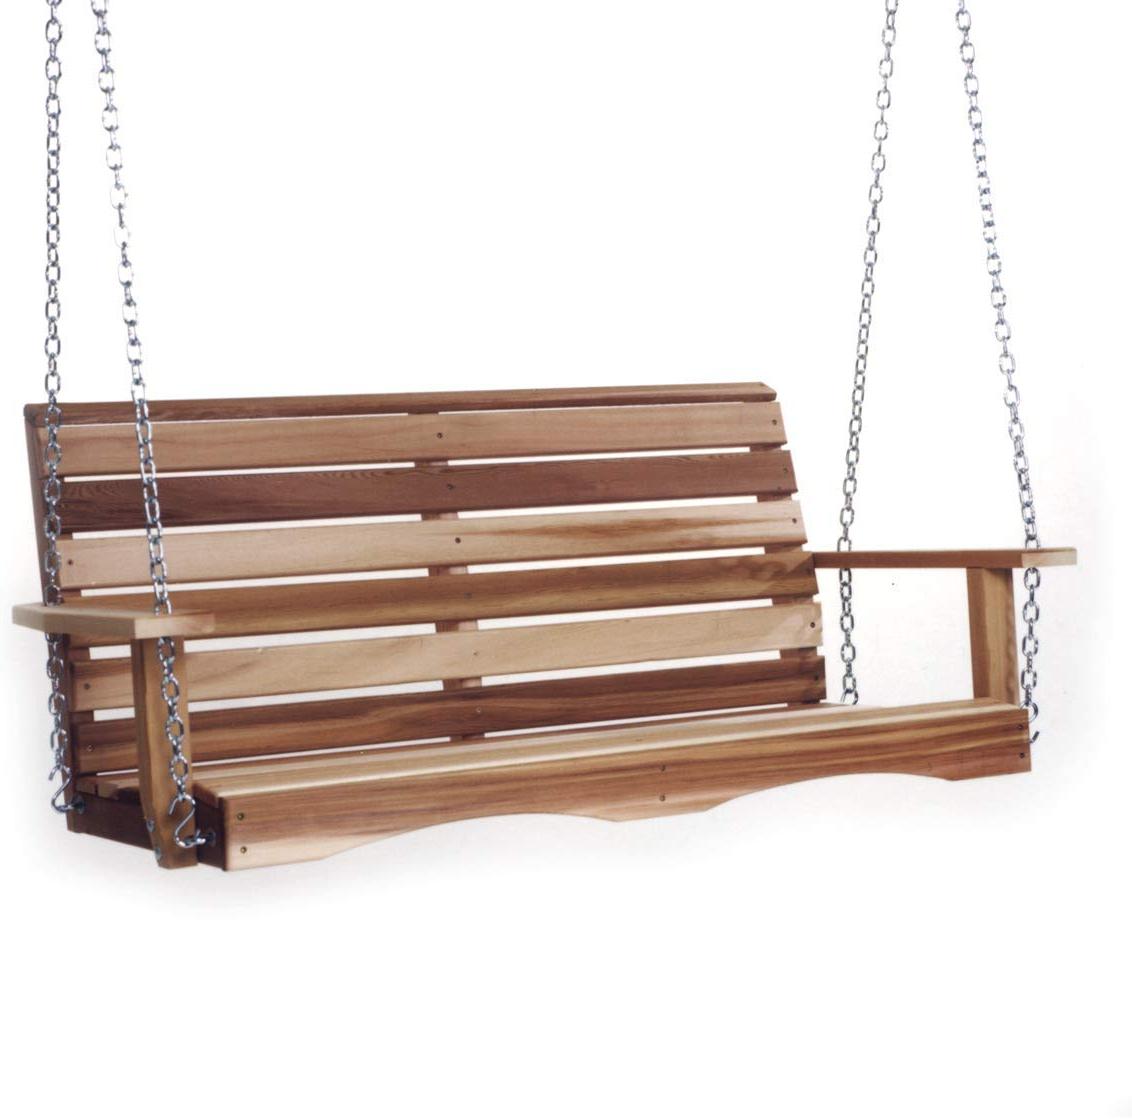 Well Known A4 Ft Cedar Pergola Swings Intended For All Things Cedar Ps48 Sw10 4 Ft Cedar Cedar Garden Swing With Comfort  Springs (View 28 of 30)